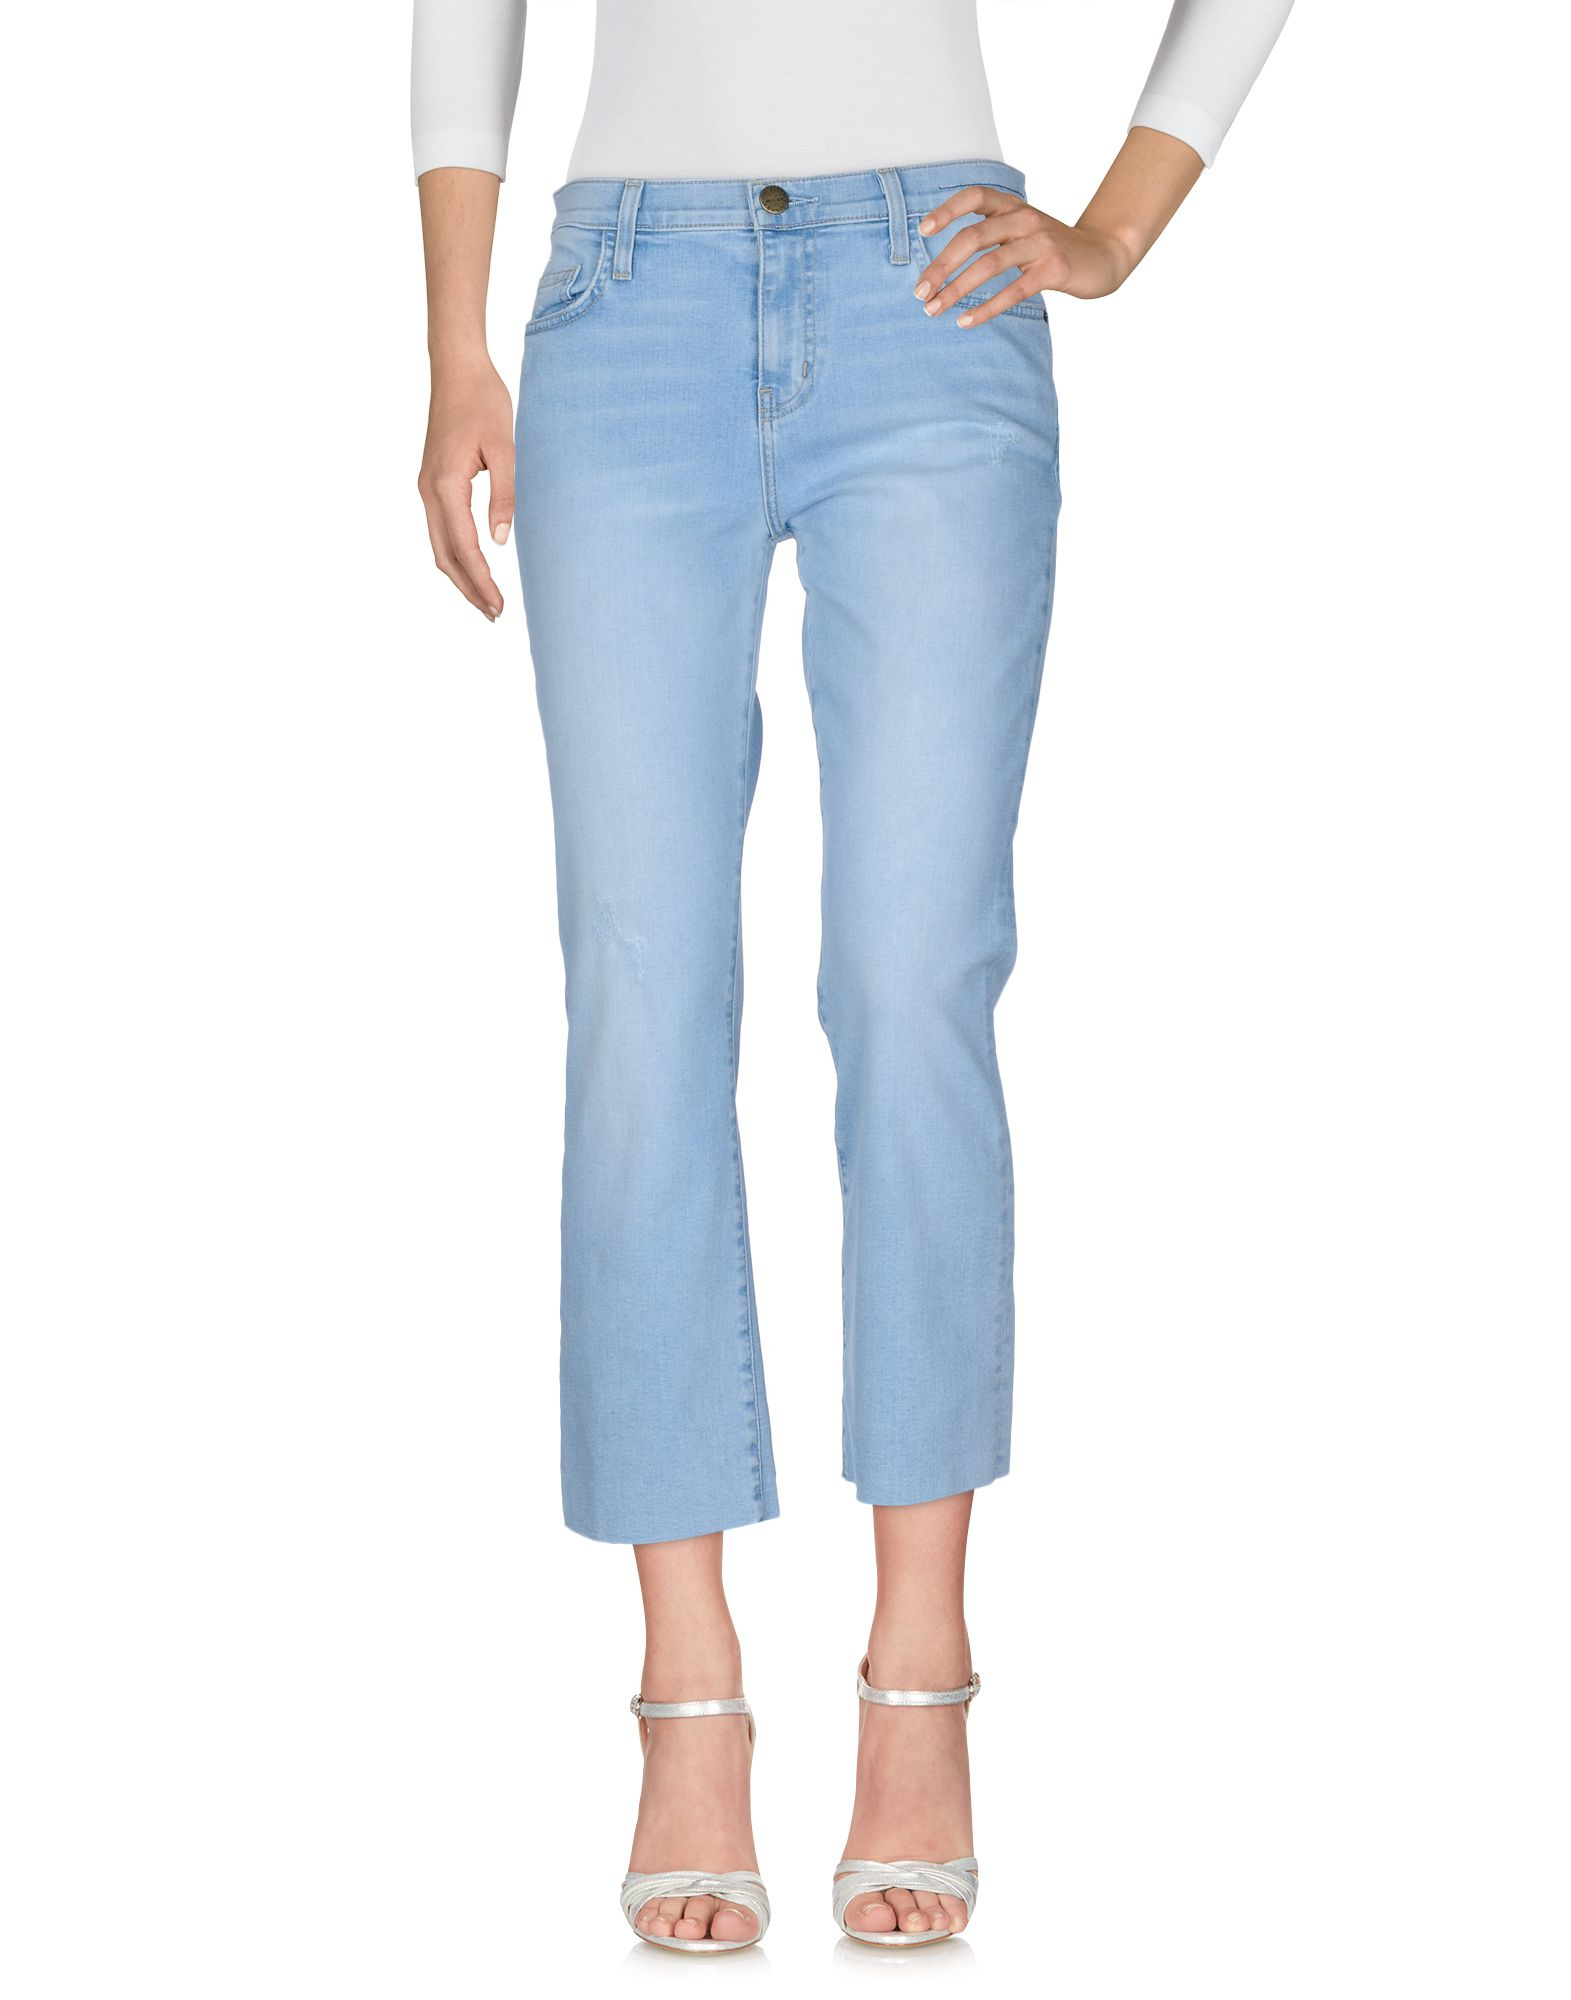 Pantaloni Jeans Current Elliott donna donna donna - 42638410OP 0d1